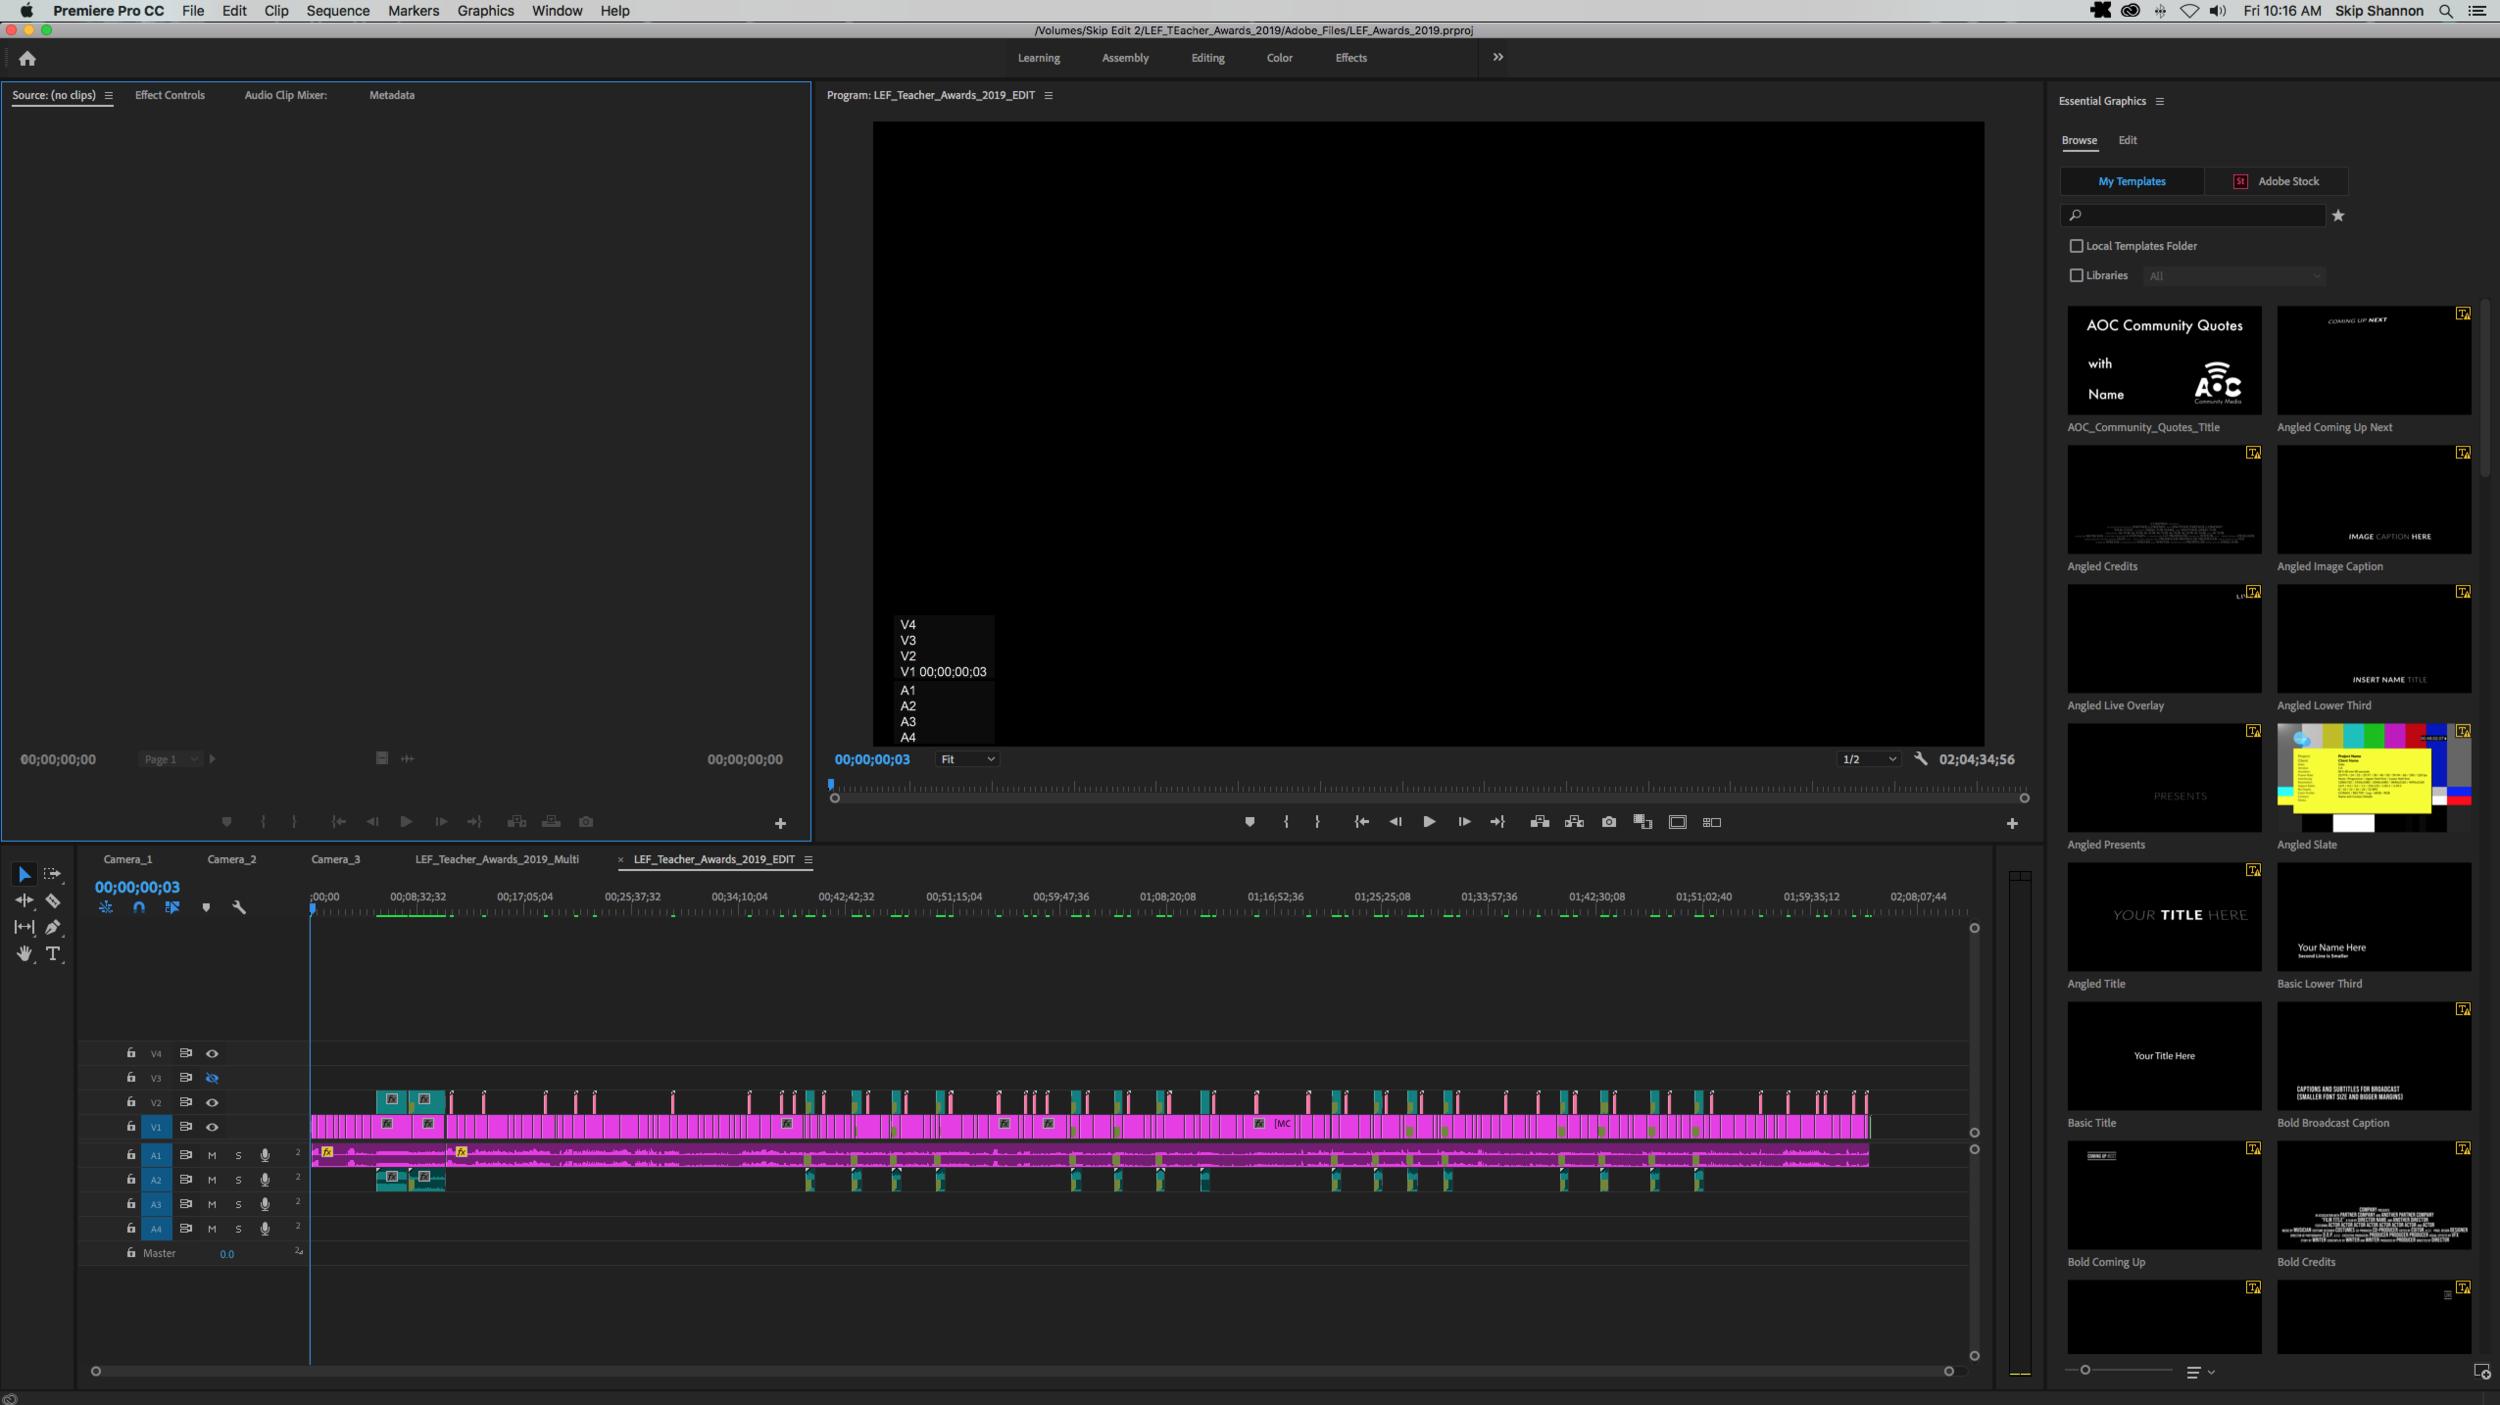 Premiere Pro Screenshot